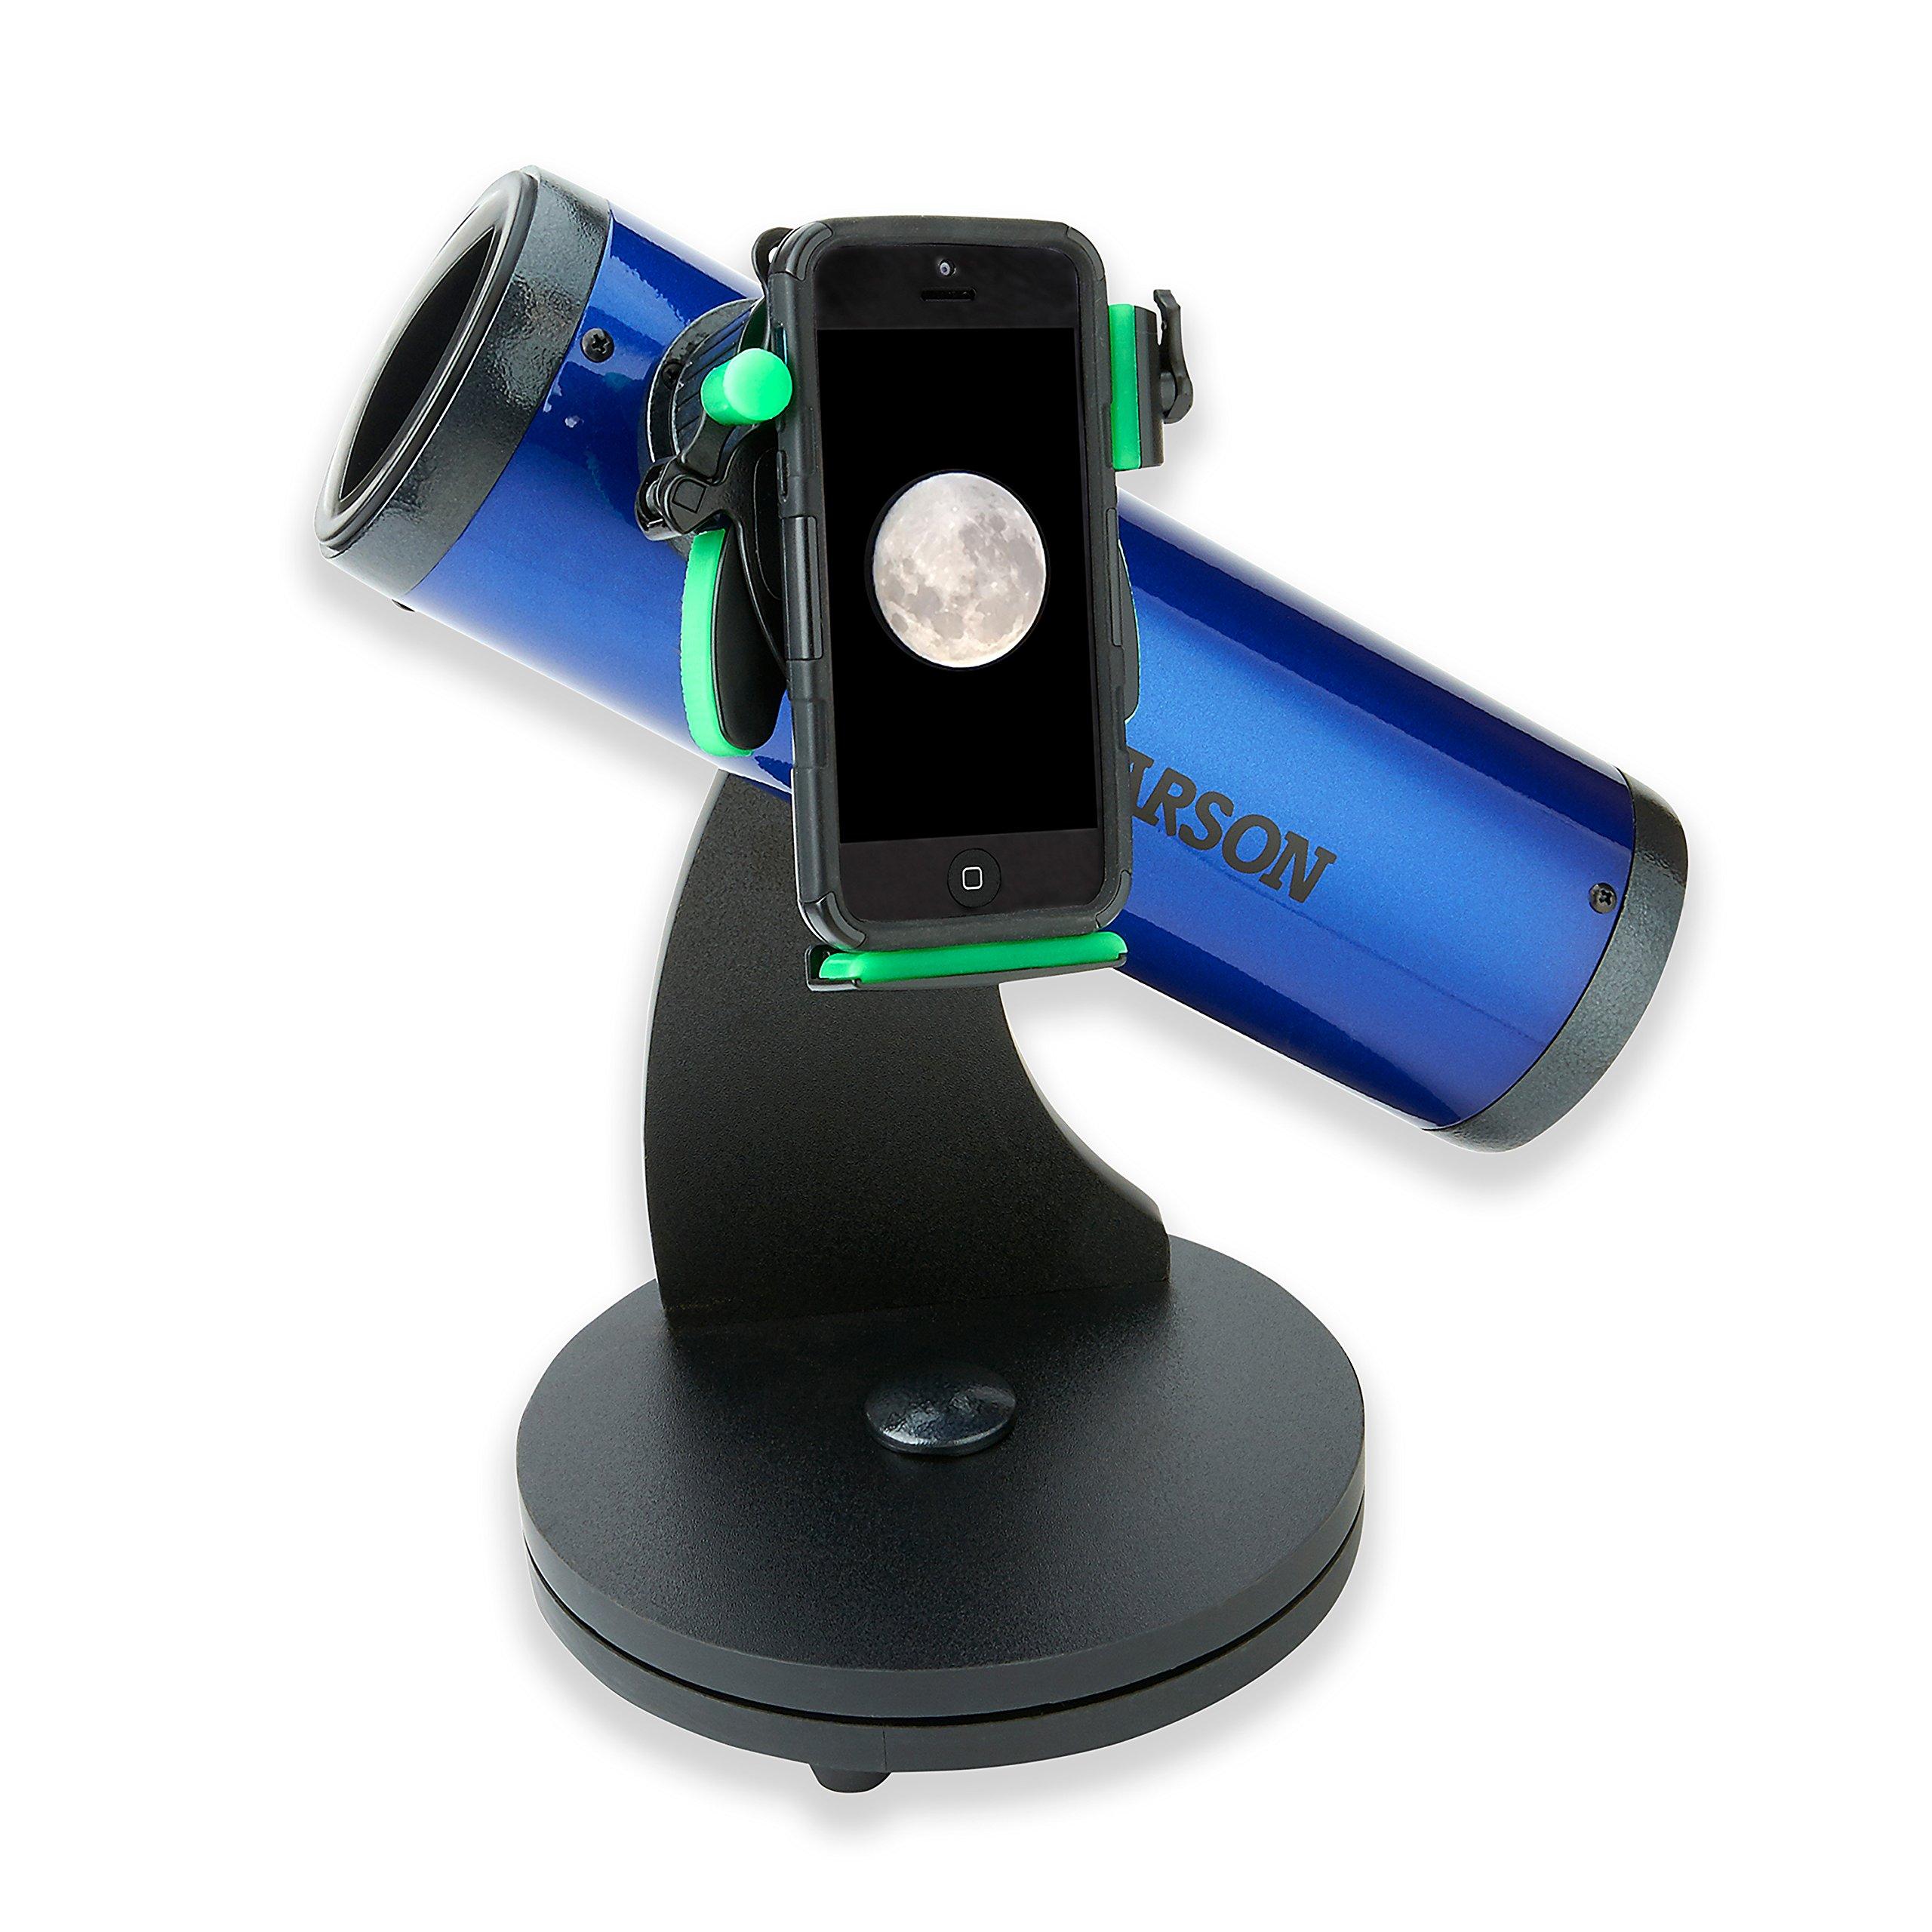 Carson SkySeeker 15x-37.5x Newtonian Reflector Beginner Telescope with Universal Smartphone Optics Digiscoping Adapter (JC-200UN) by Carson